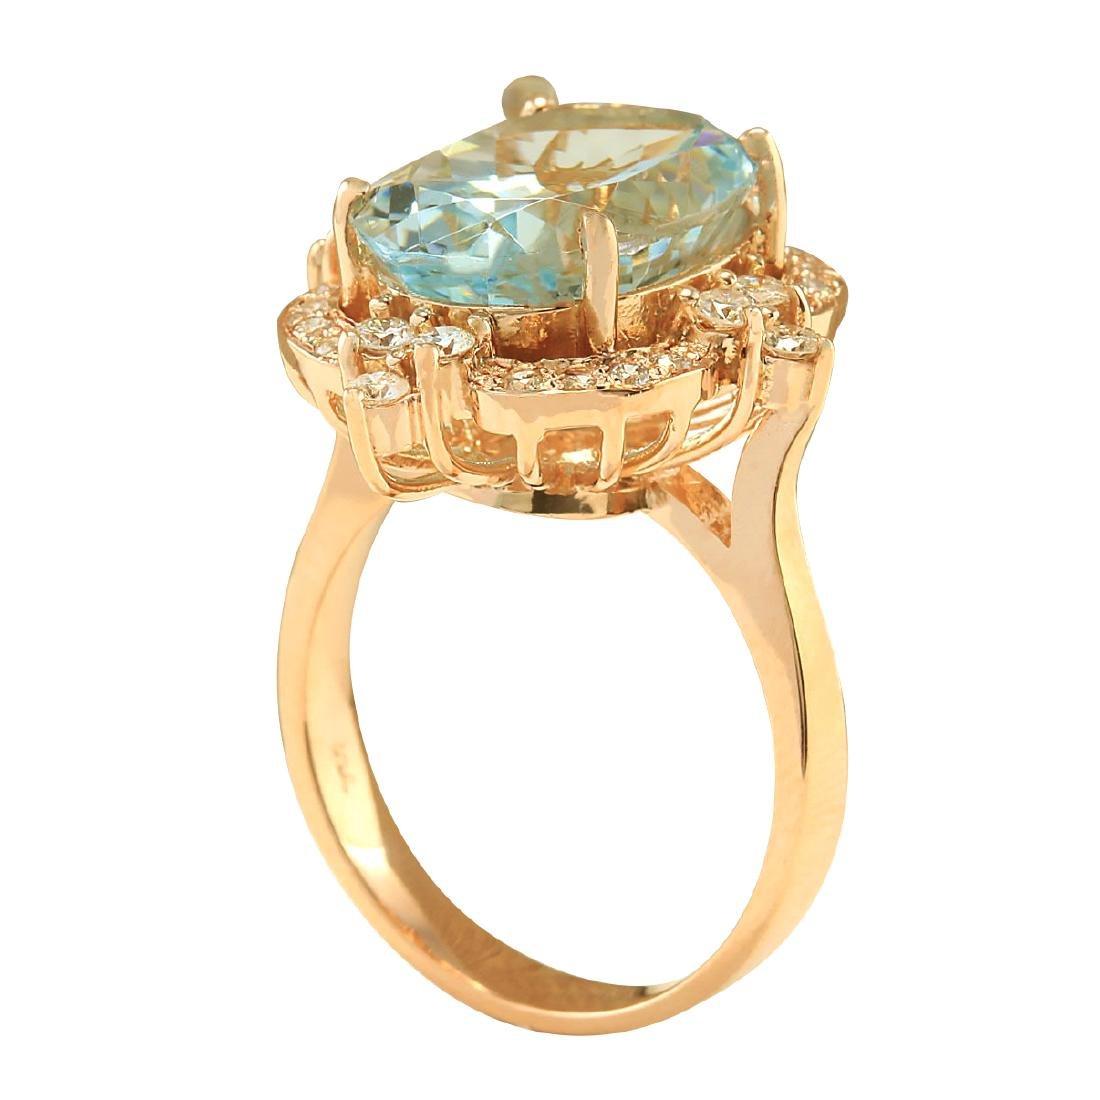 8.27CTW Natural Aquamarine And Diamond Ring In 18K Rose - 3